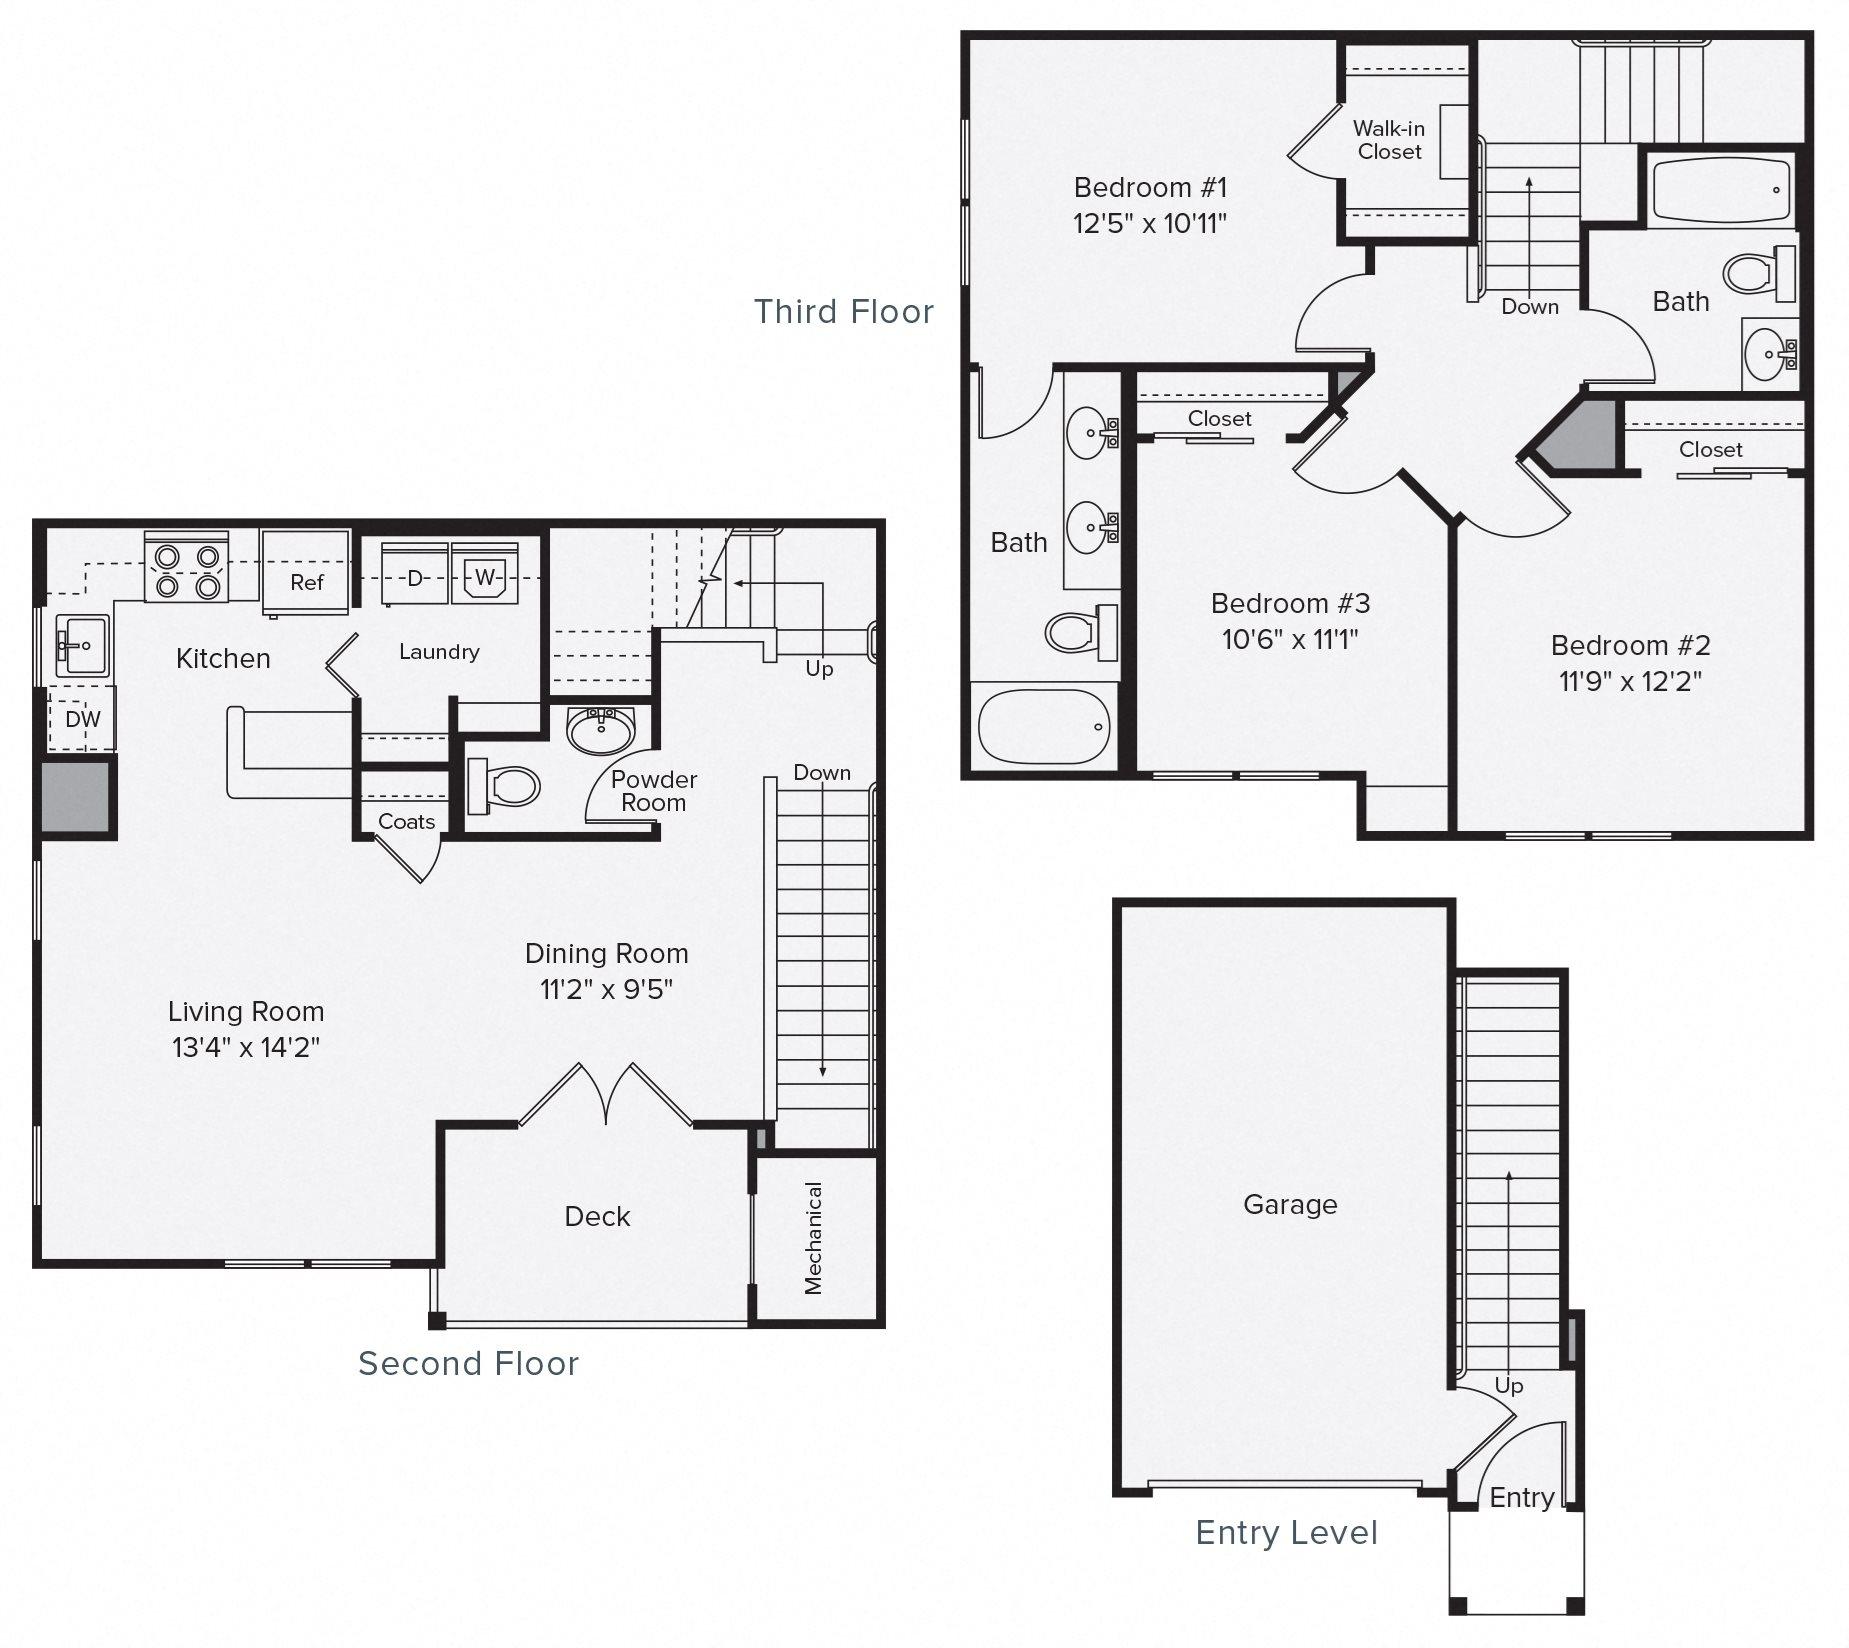 3A Floor Plan 14